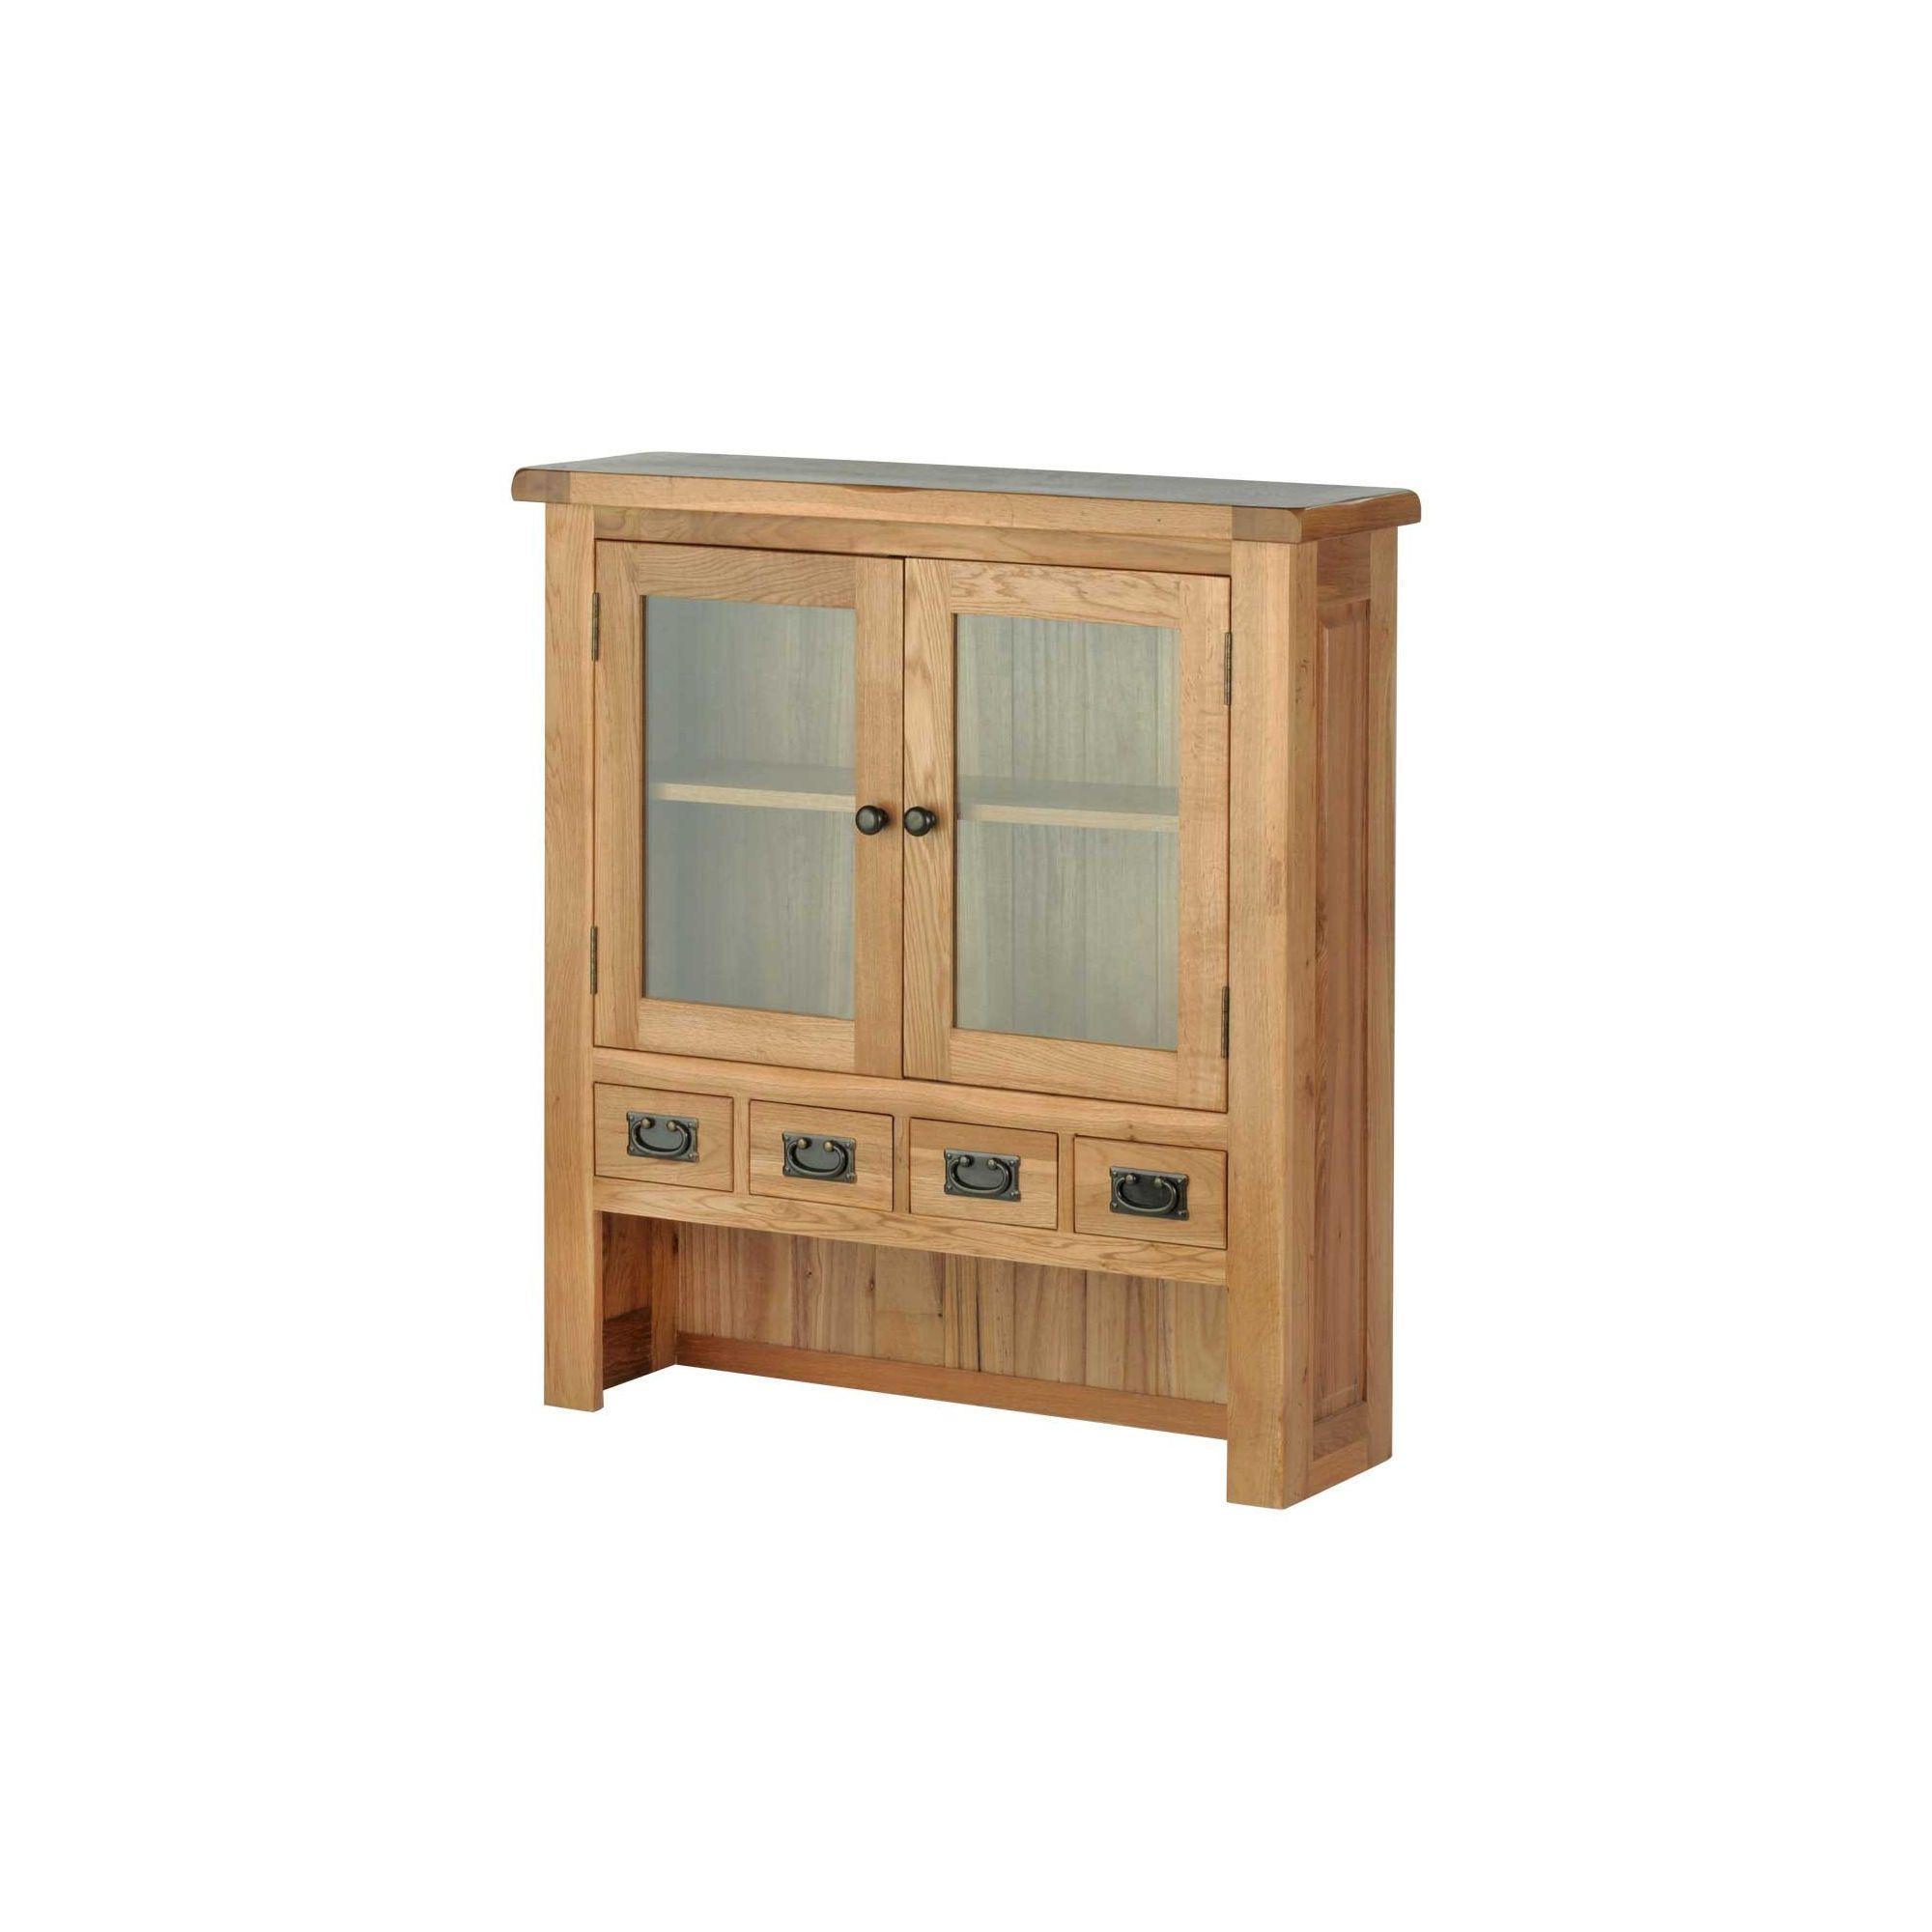 Thorndon Sandown Standard Sideboard Top in Rustic Oak at Tesco Direct